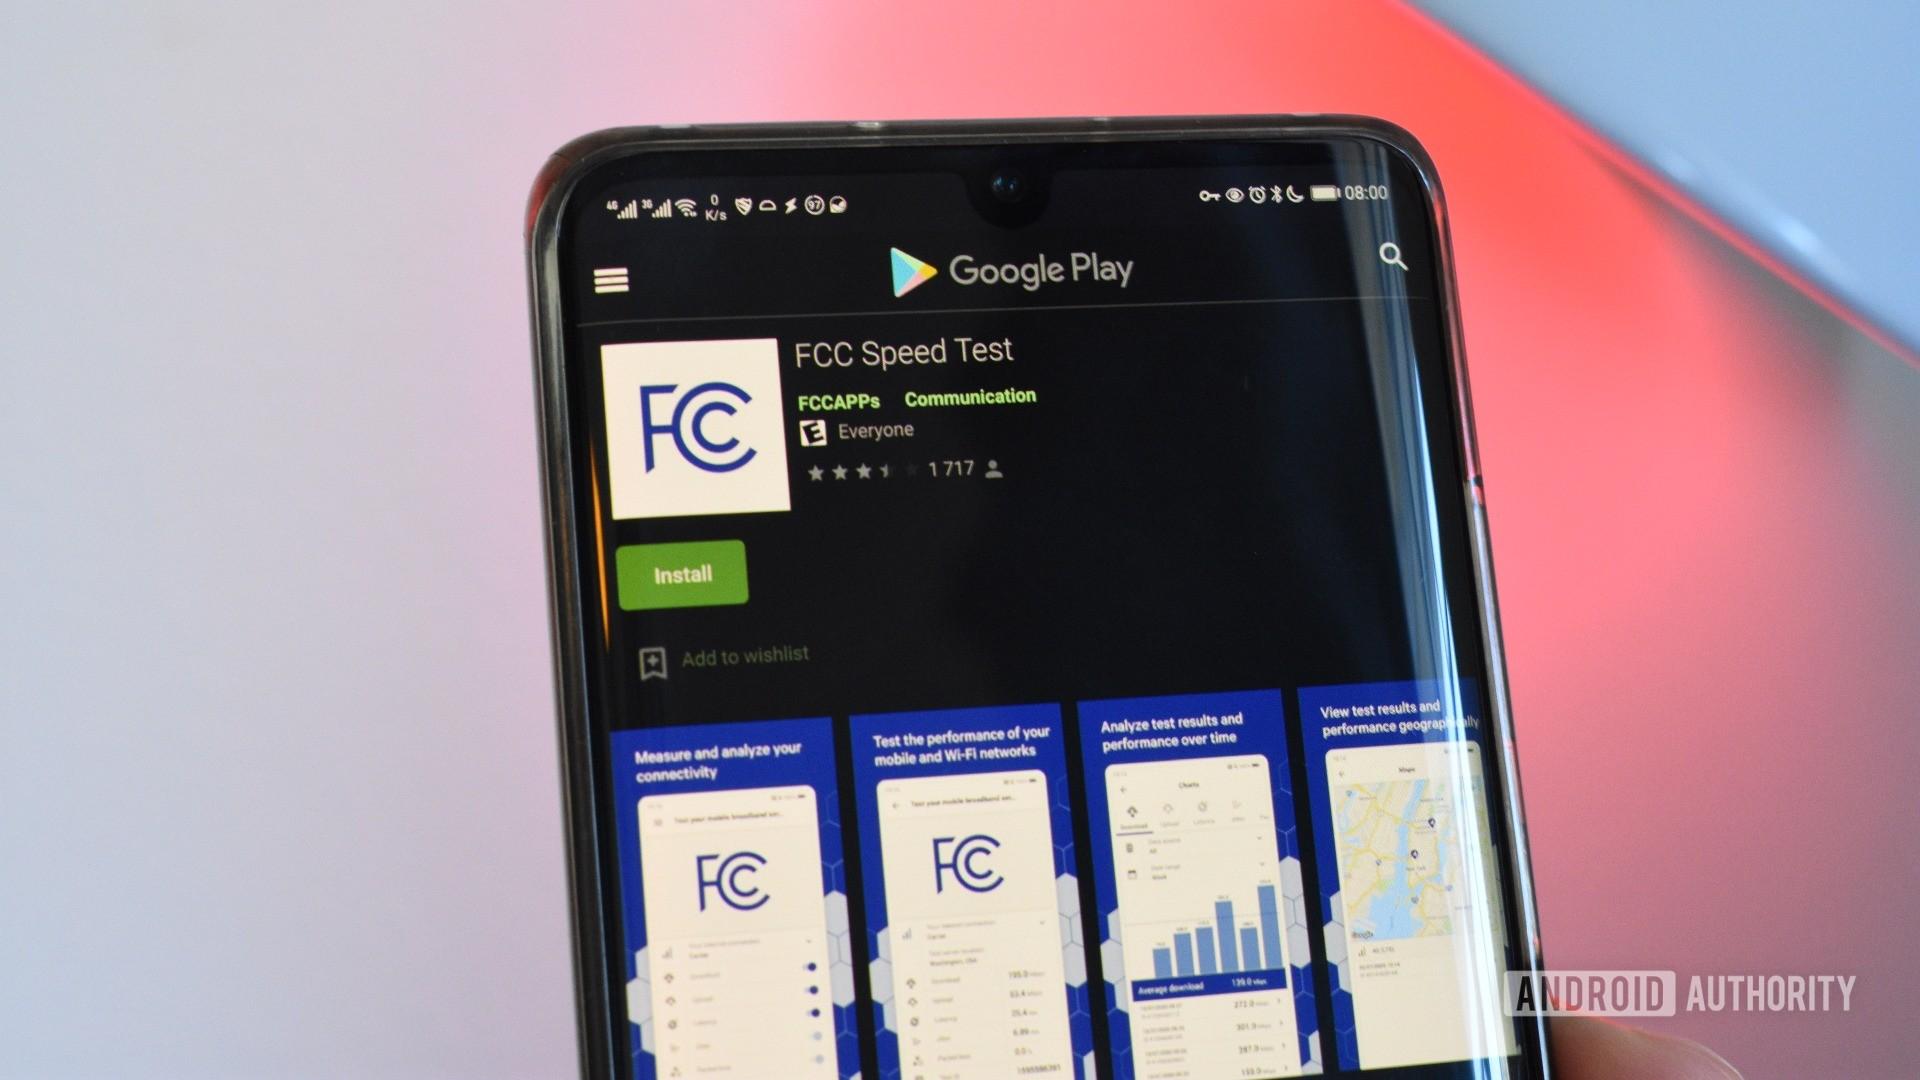 fcc speed test app google play